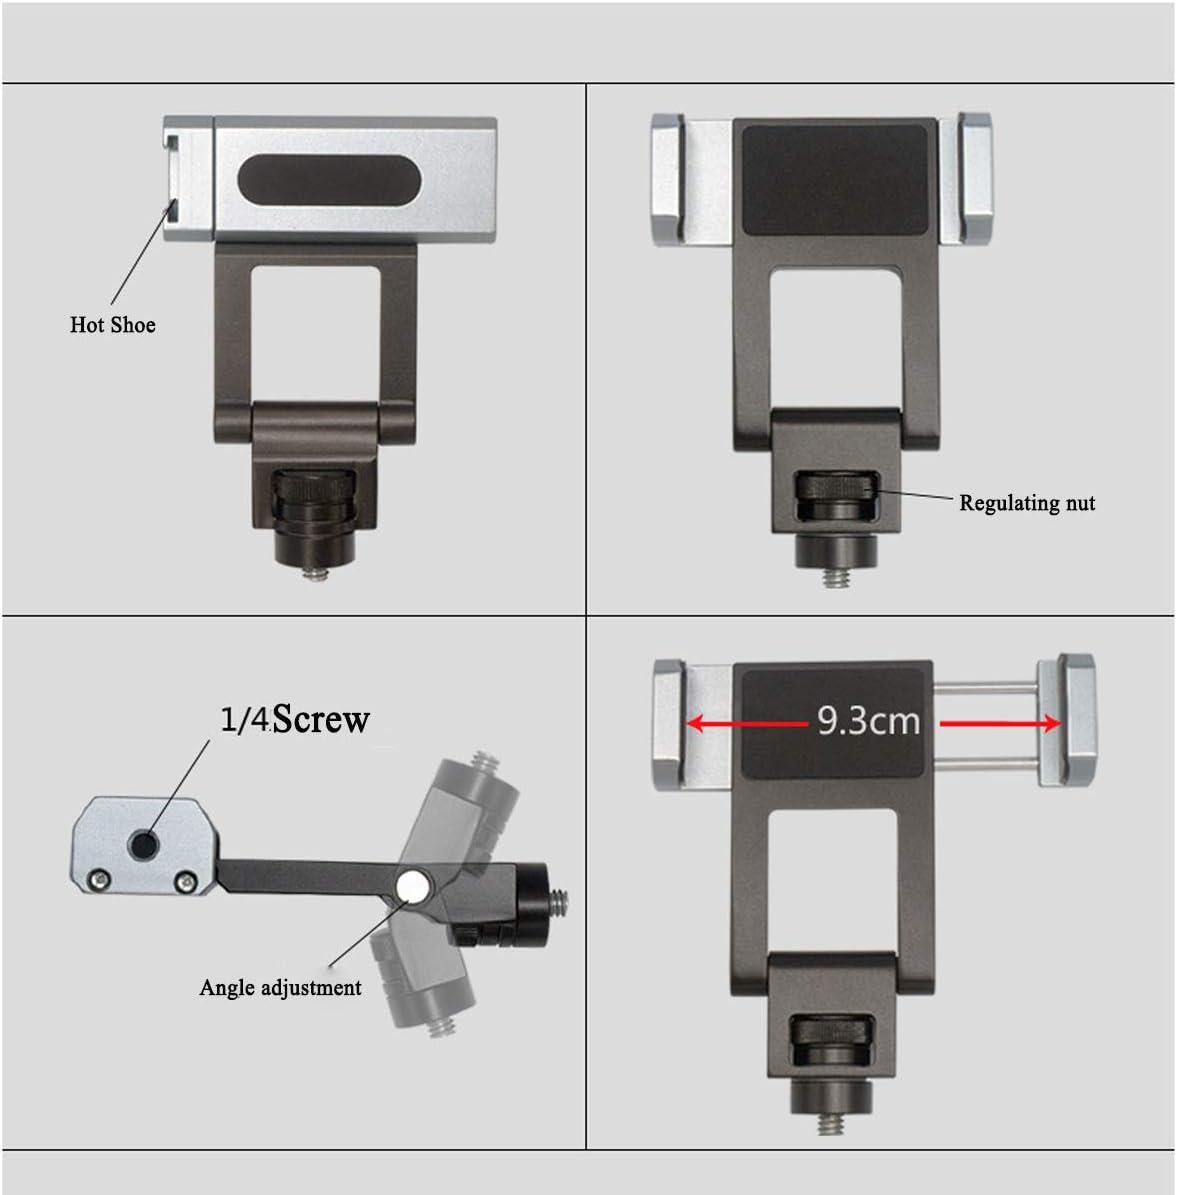 Hurricanes Universal 1//4 Screw Cellphone Clamp Mobile Phone Clip Extension Bracket for Zhiyun Weebill M 2 Crane 3 Feiyu Freevision Stabilizer Phone Holder